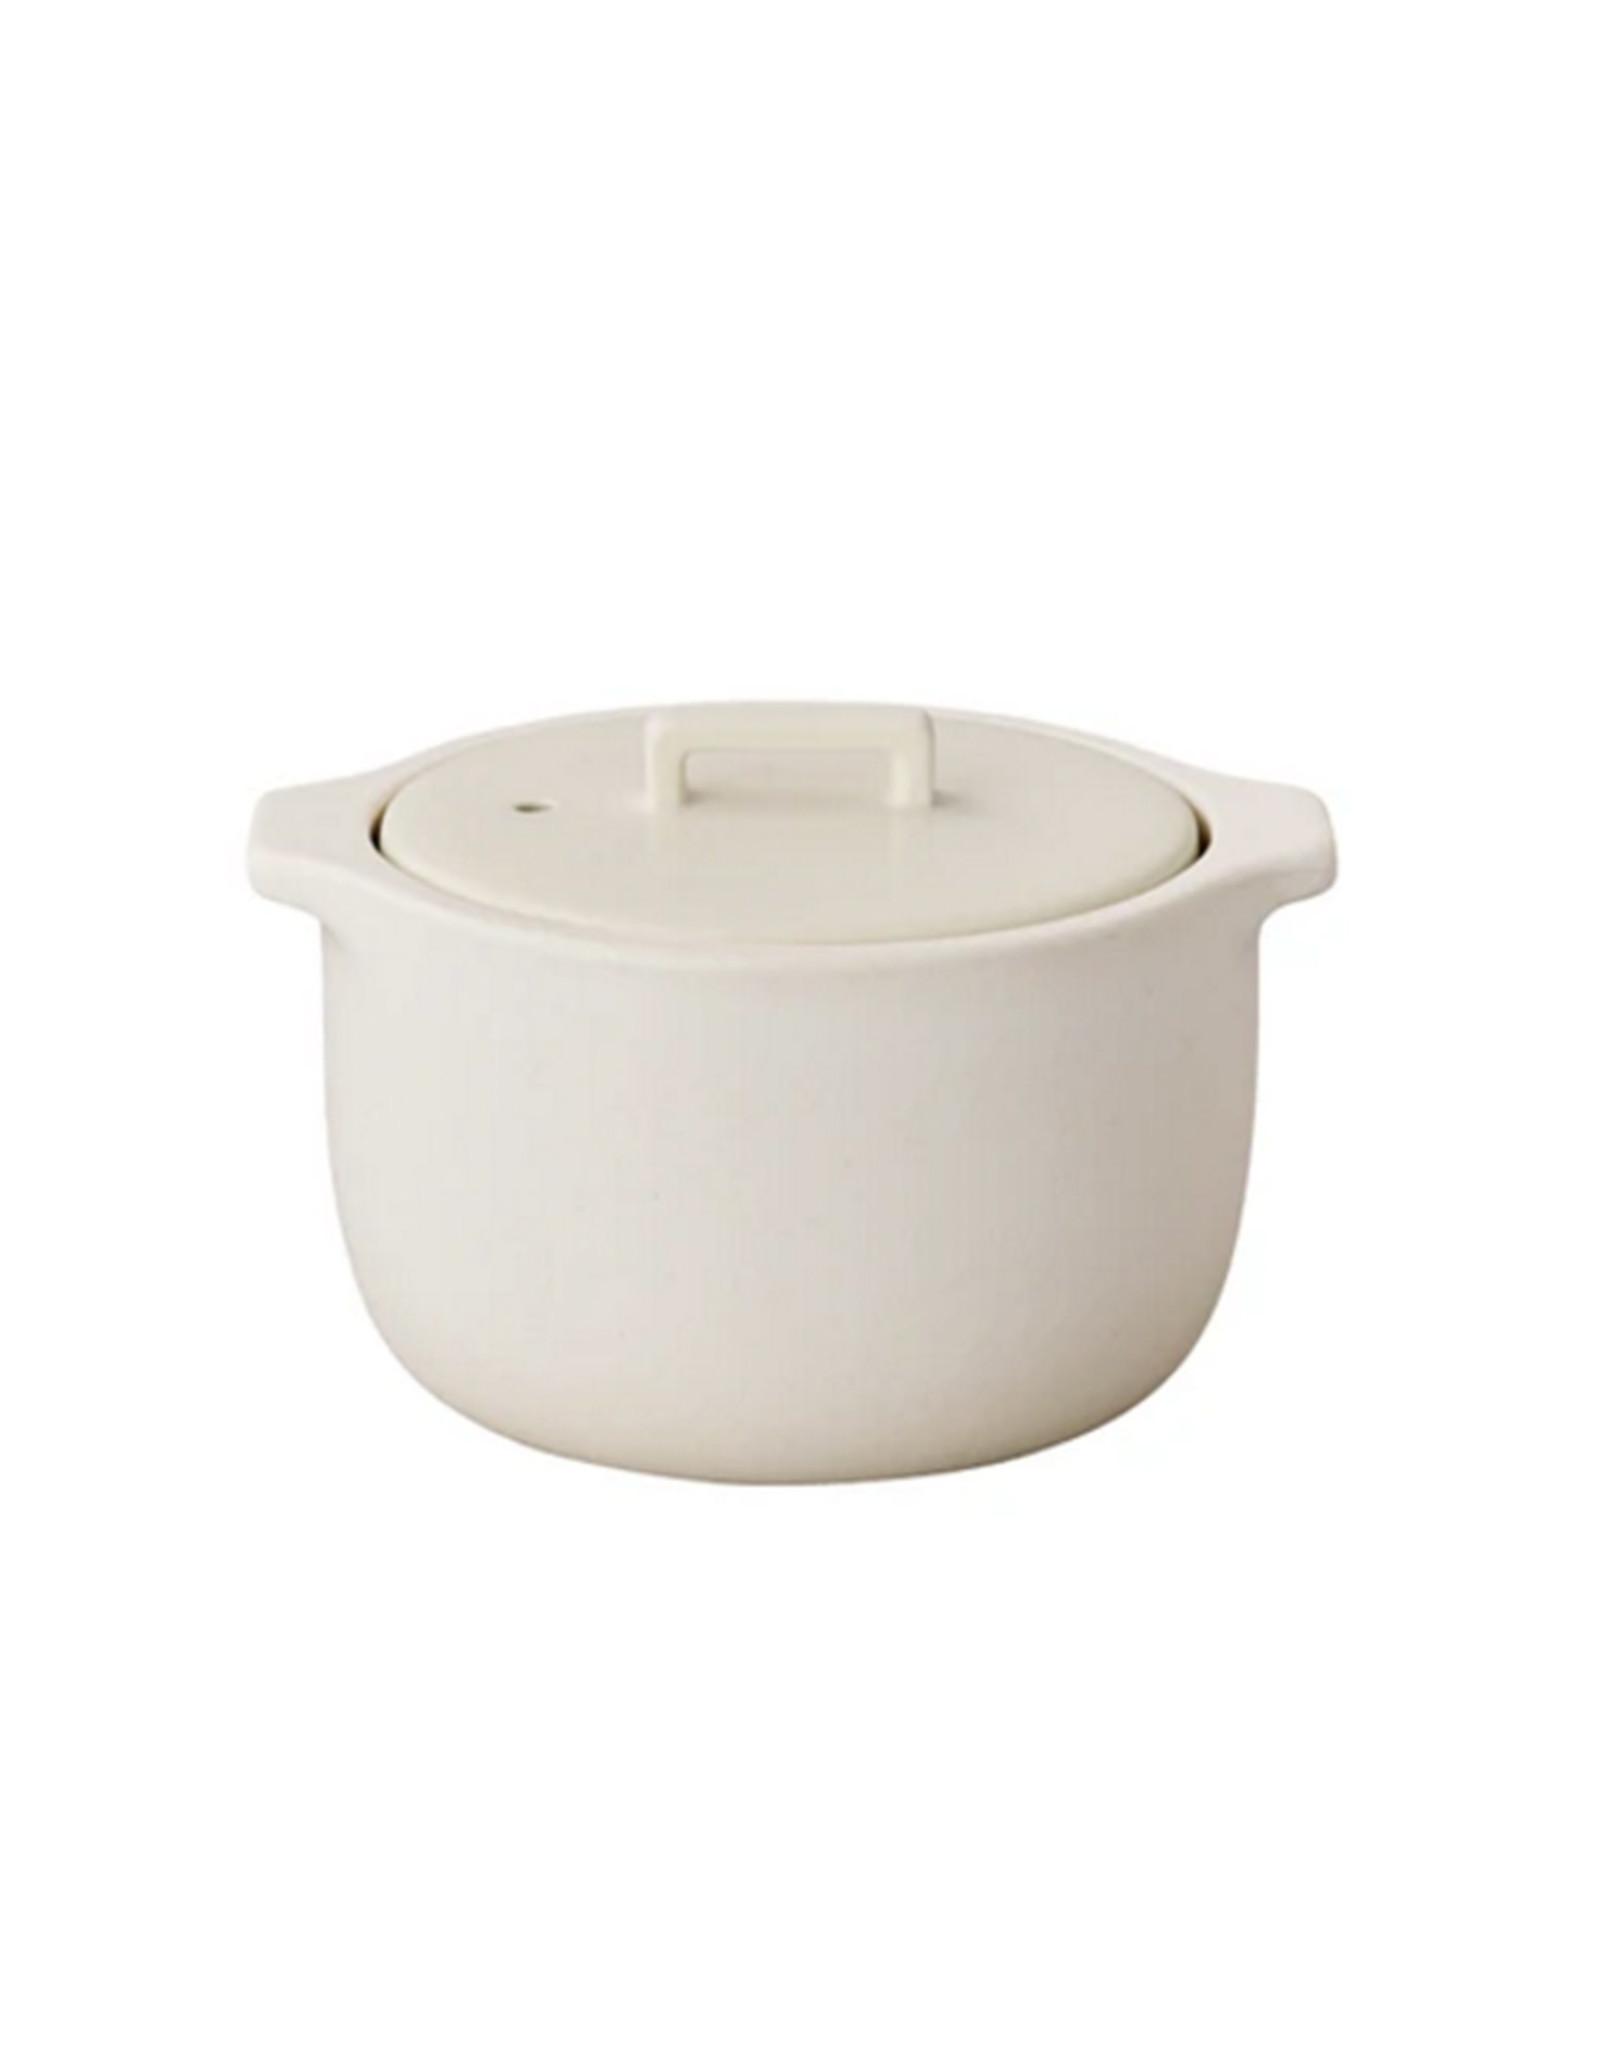 Kinto Kakomi Rice Cooker 1.2L, White